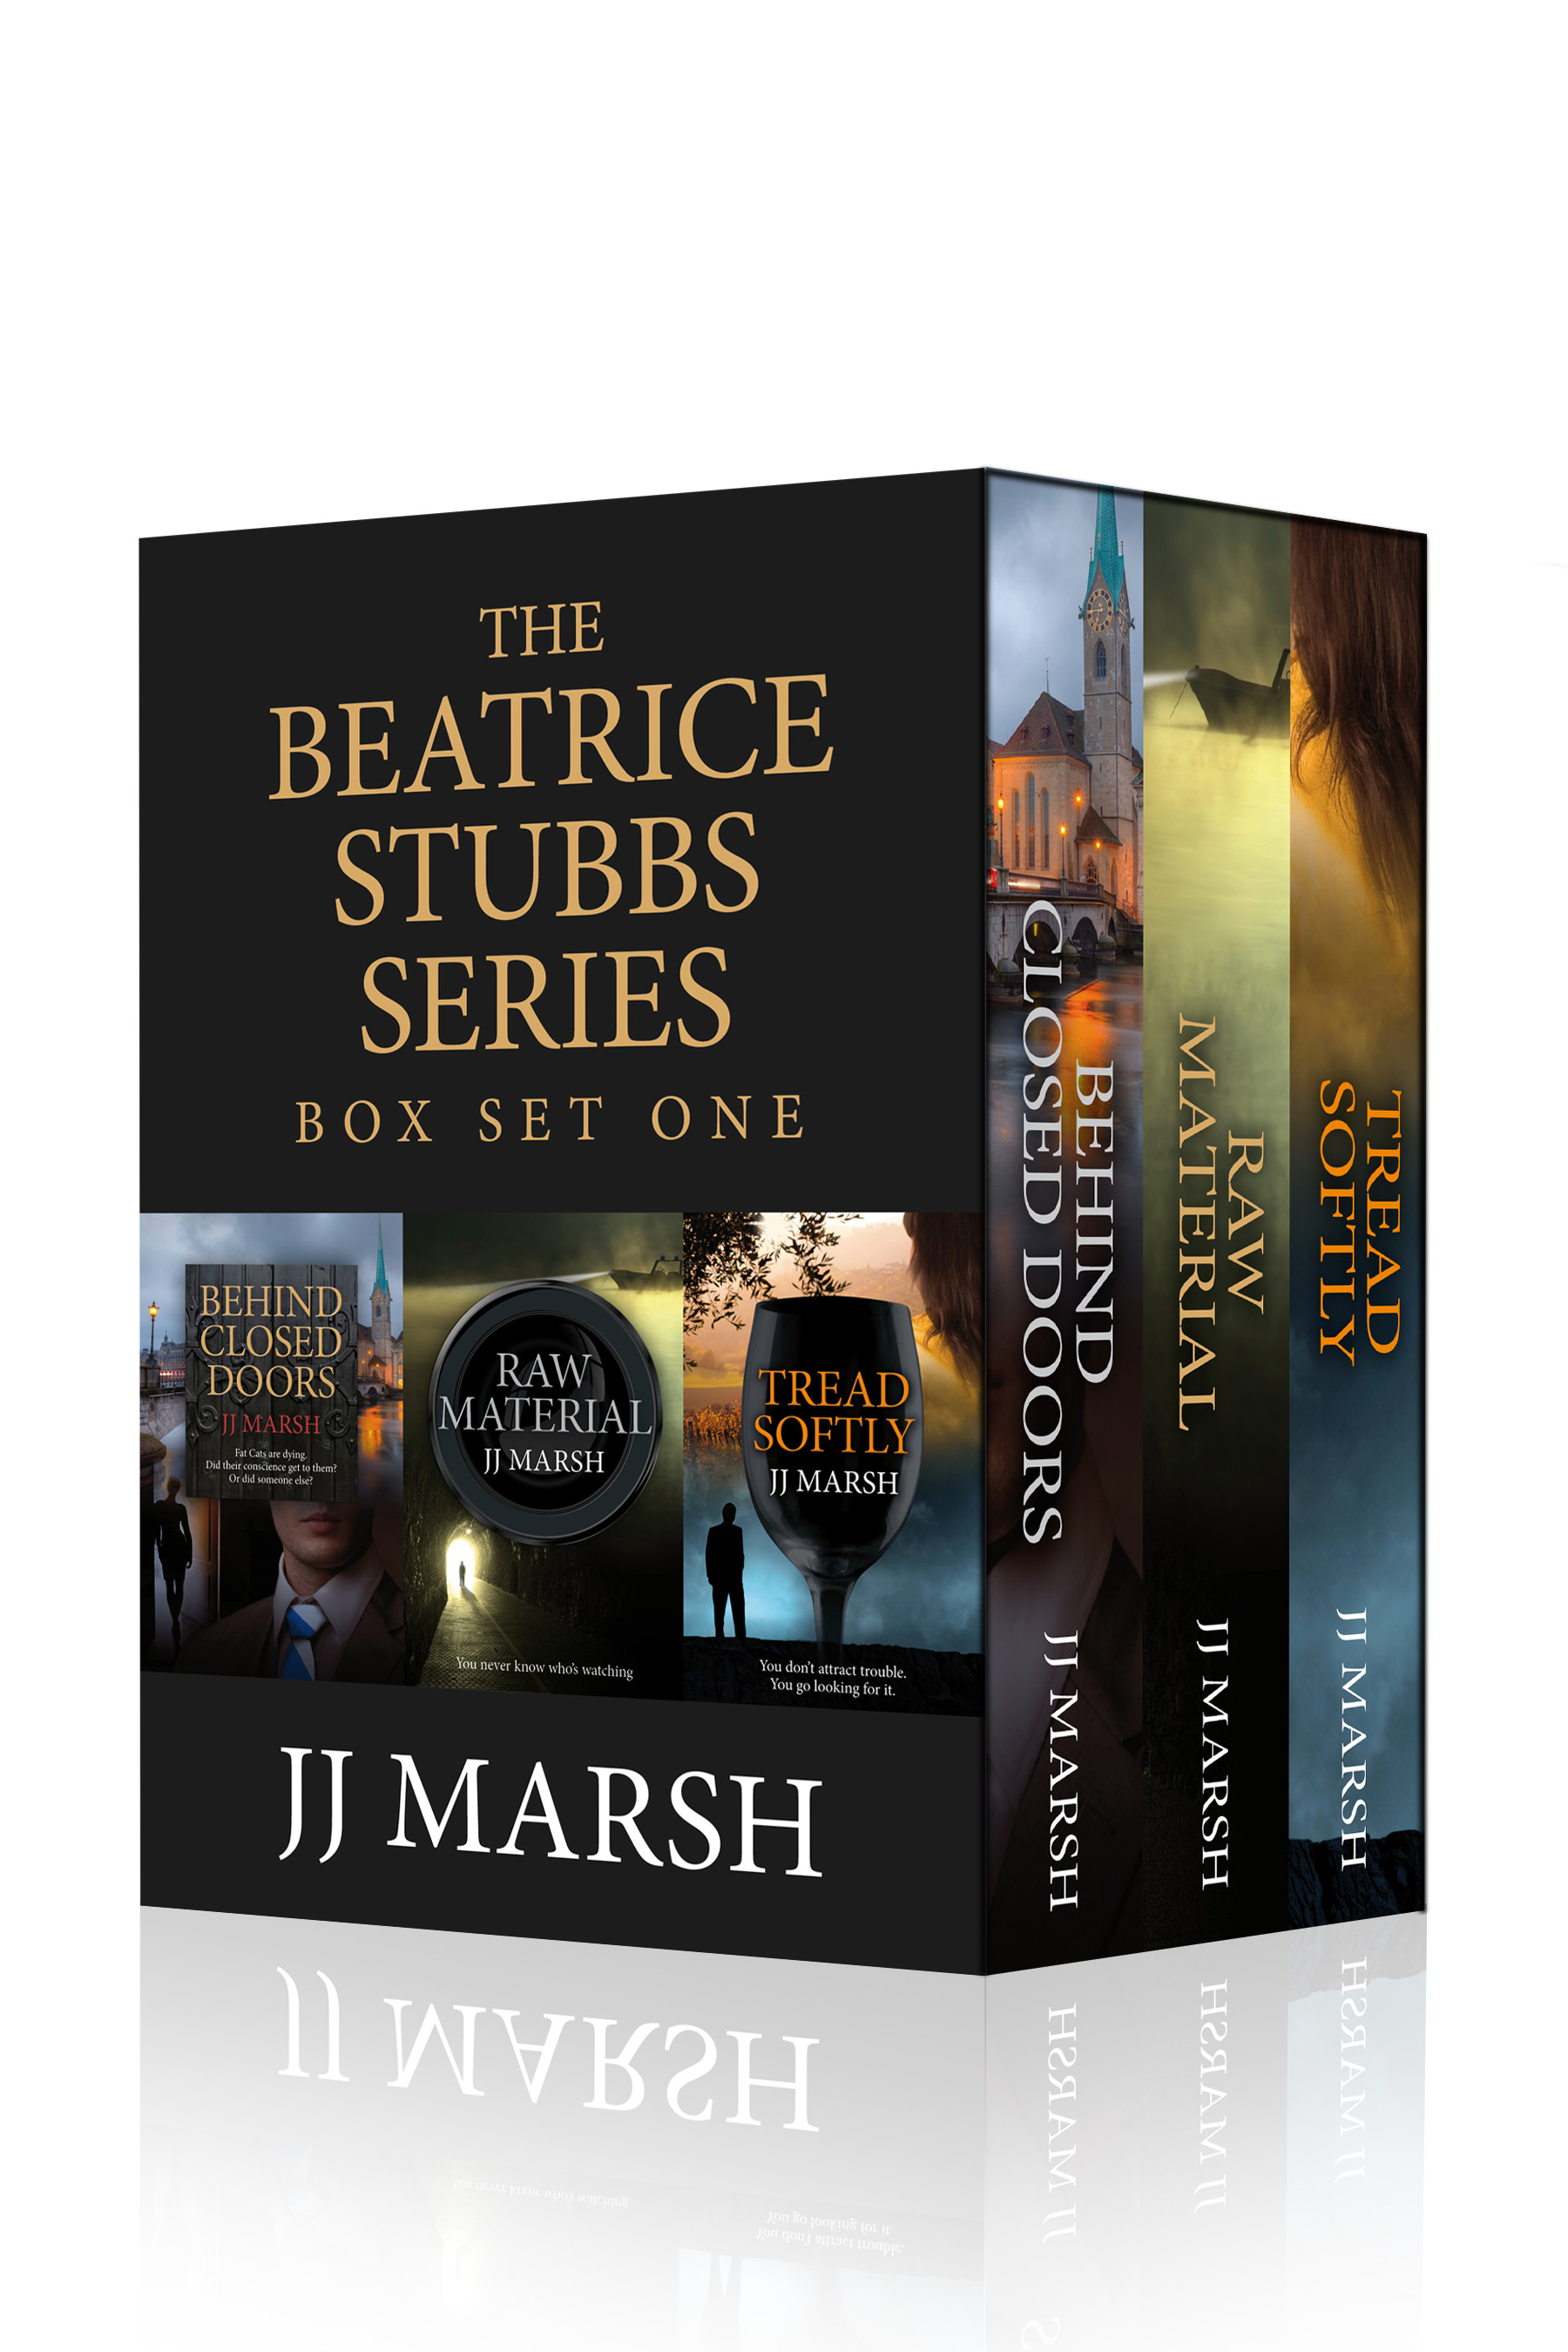 Beatrice Stubbs Box Set One_KINDLE KOBO.jpg